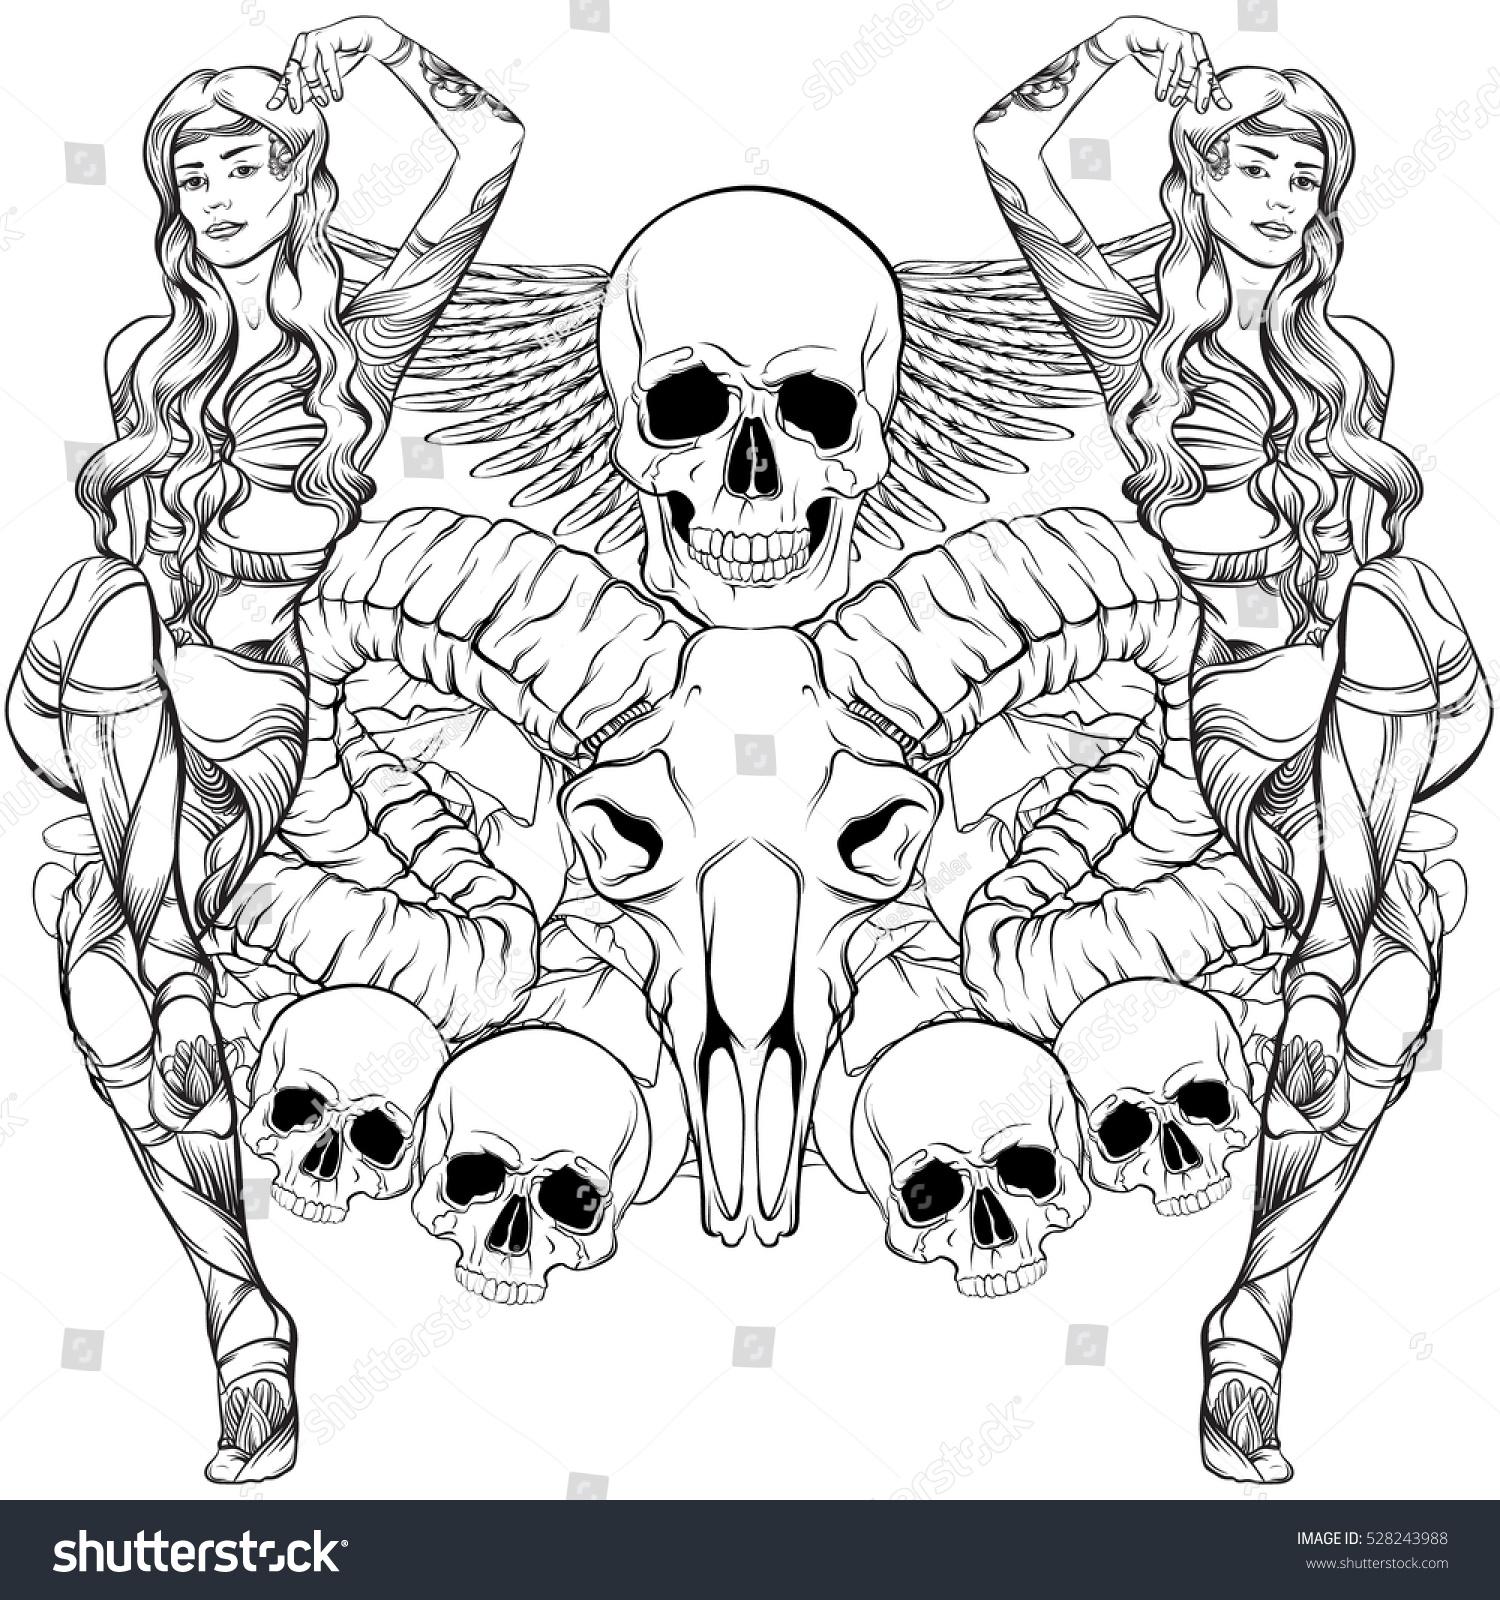 Vector Illustration Beautiful Elf Ram Human Stock Vector 528243988 ...